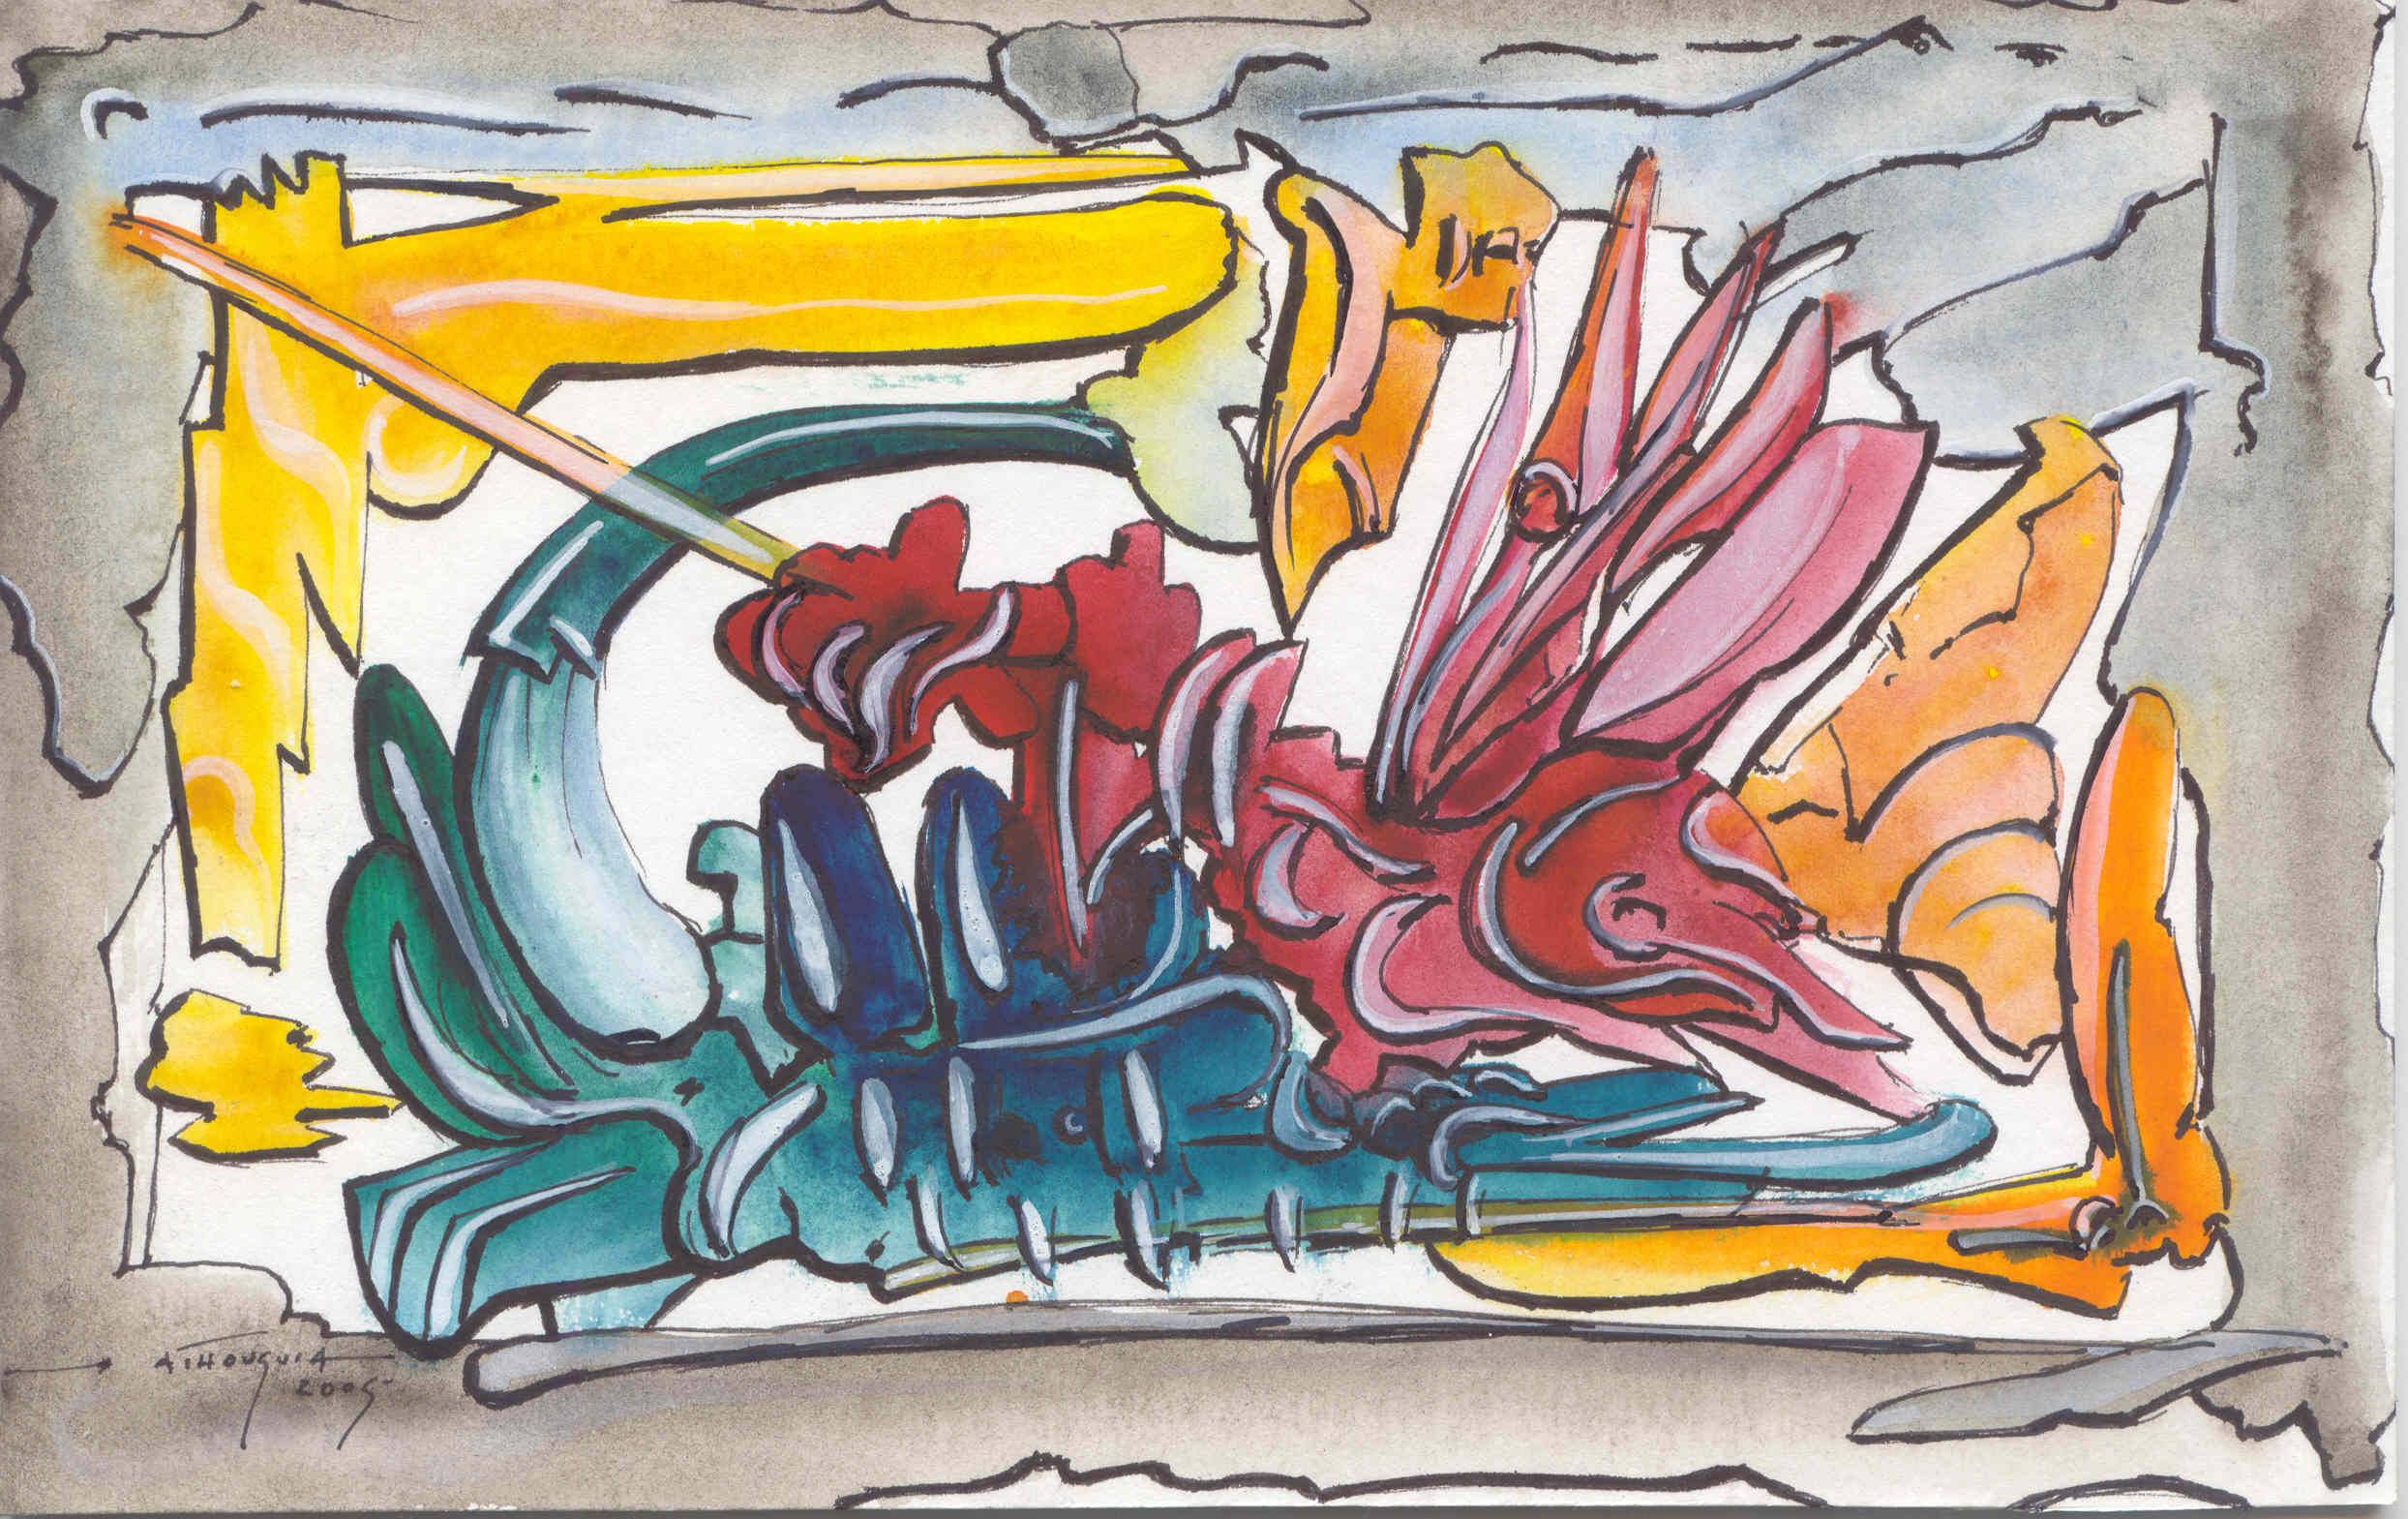 5ImaterialidPedro_Inácio.jpg